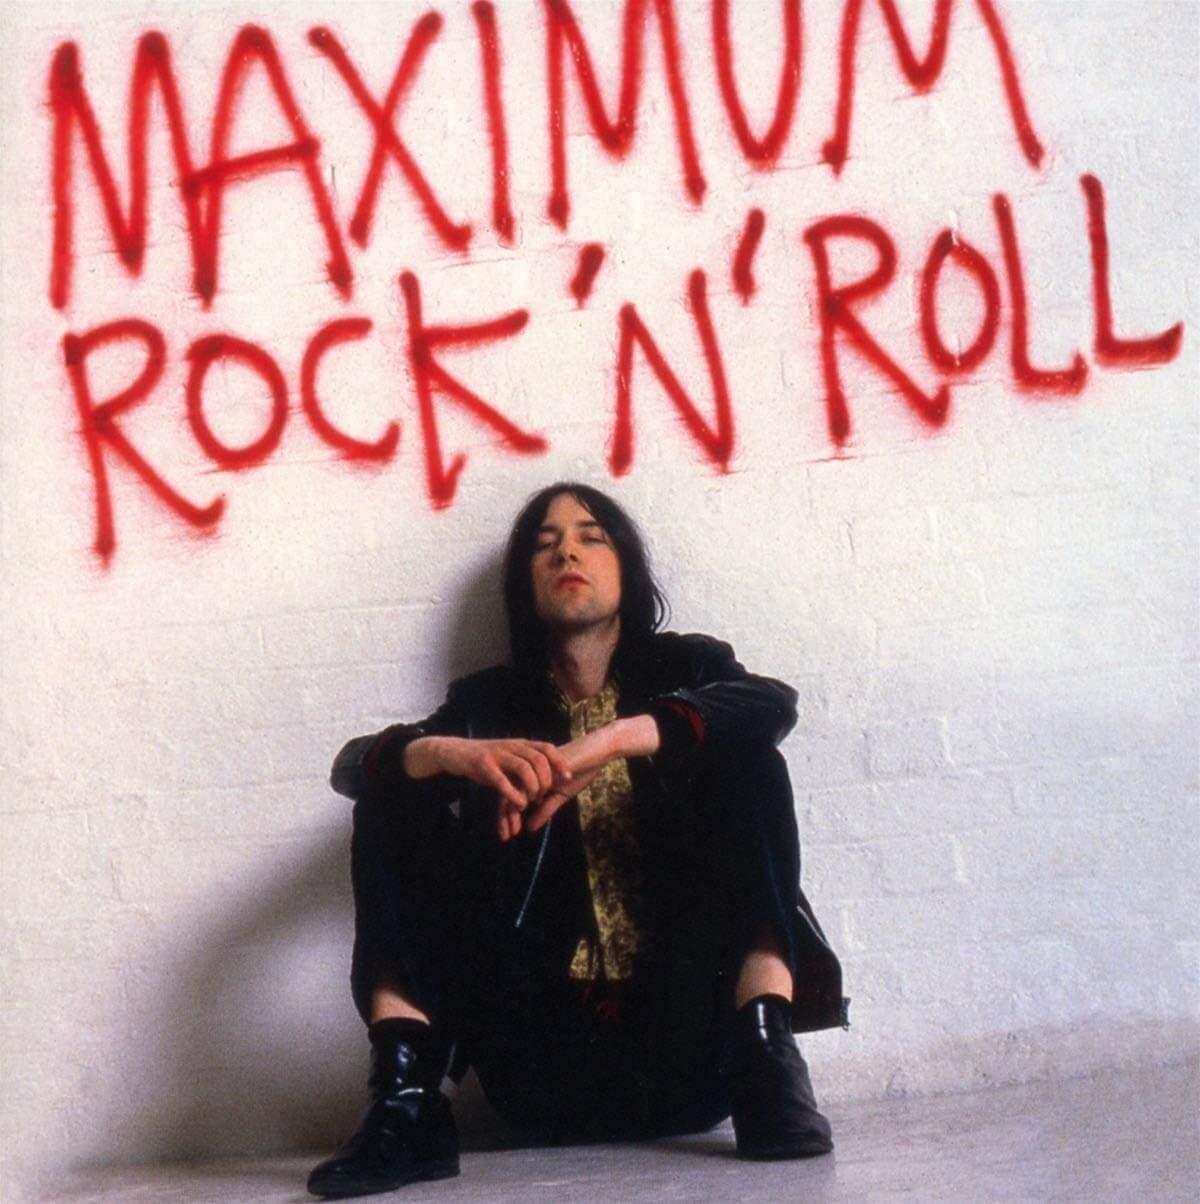 Primal Scream - Maximum RockNRoll